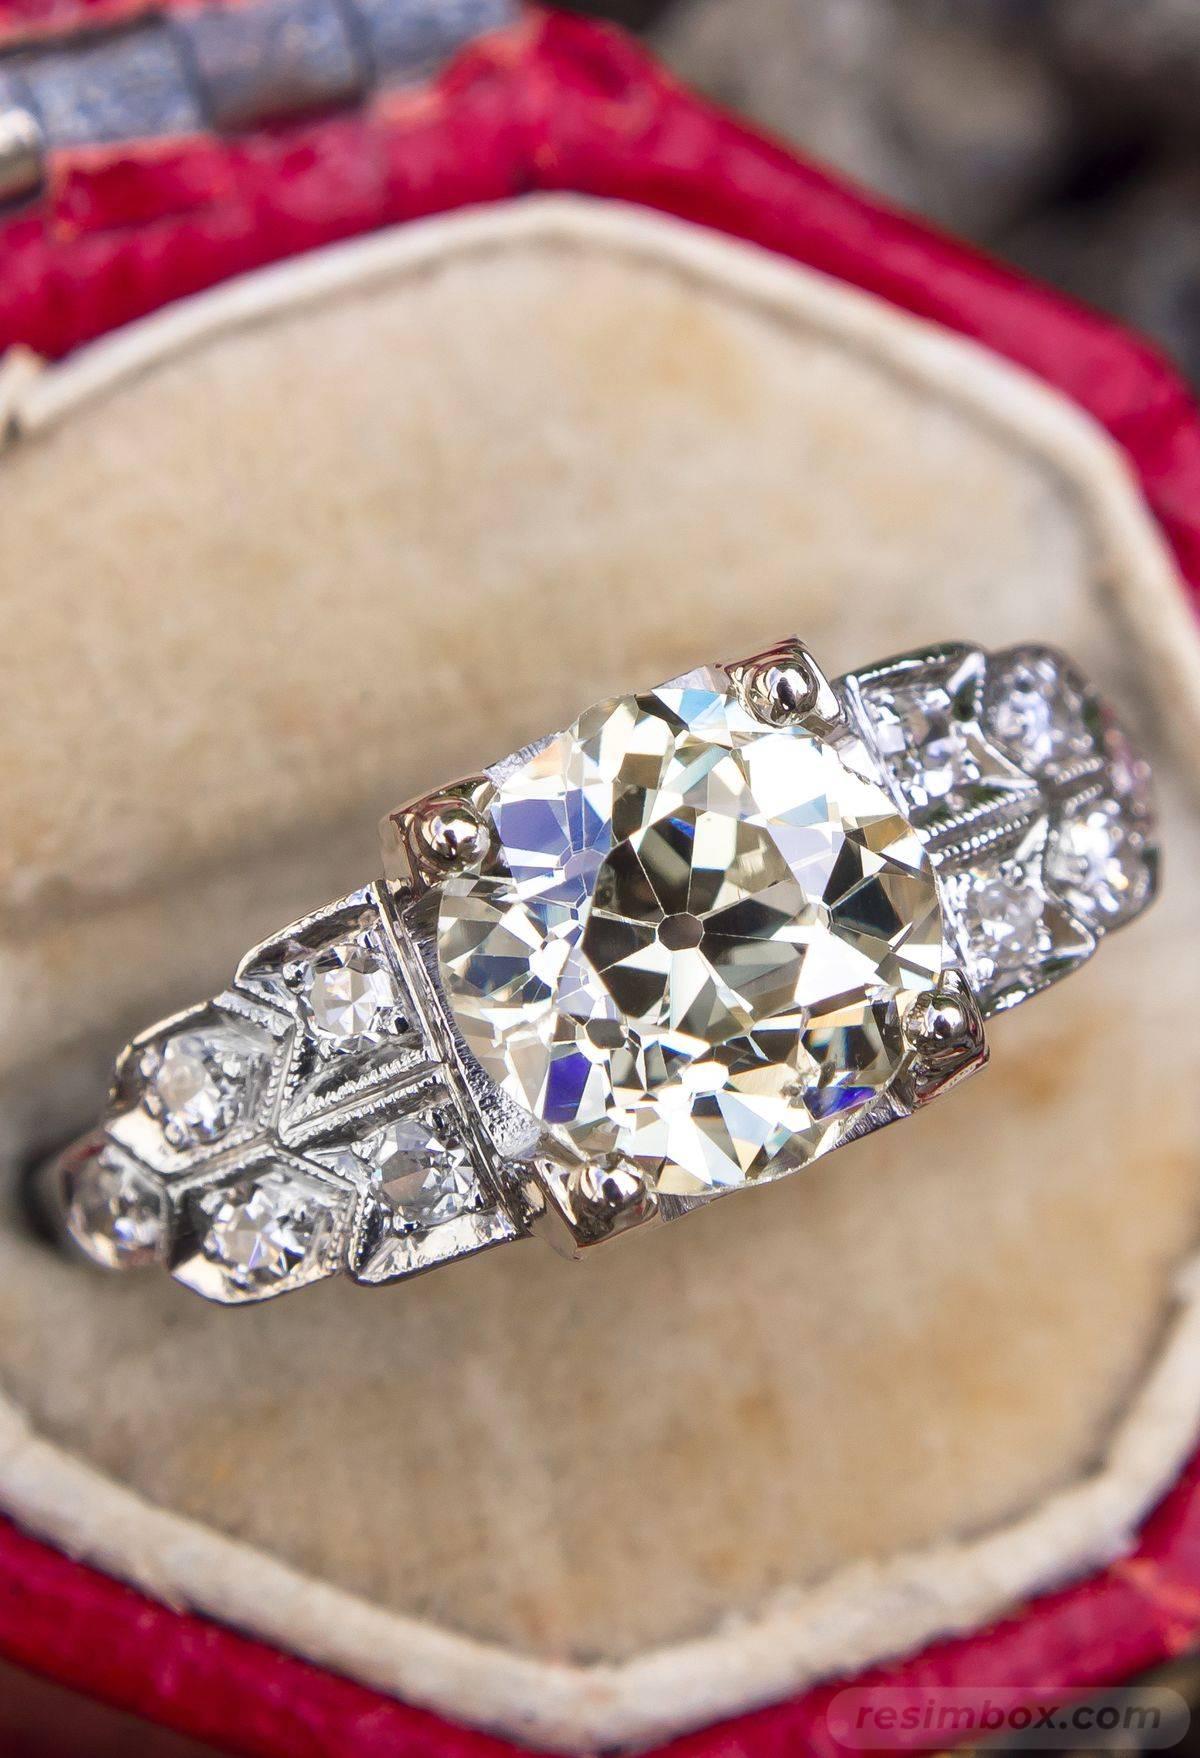 Art deco jewelry-104708760071634006